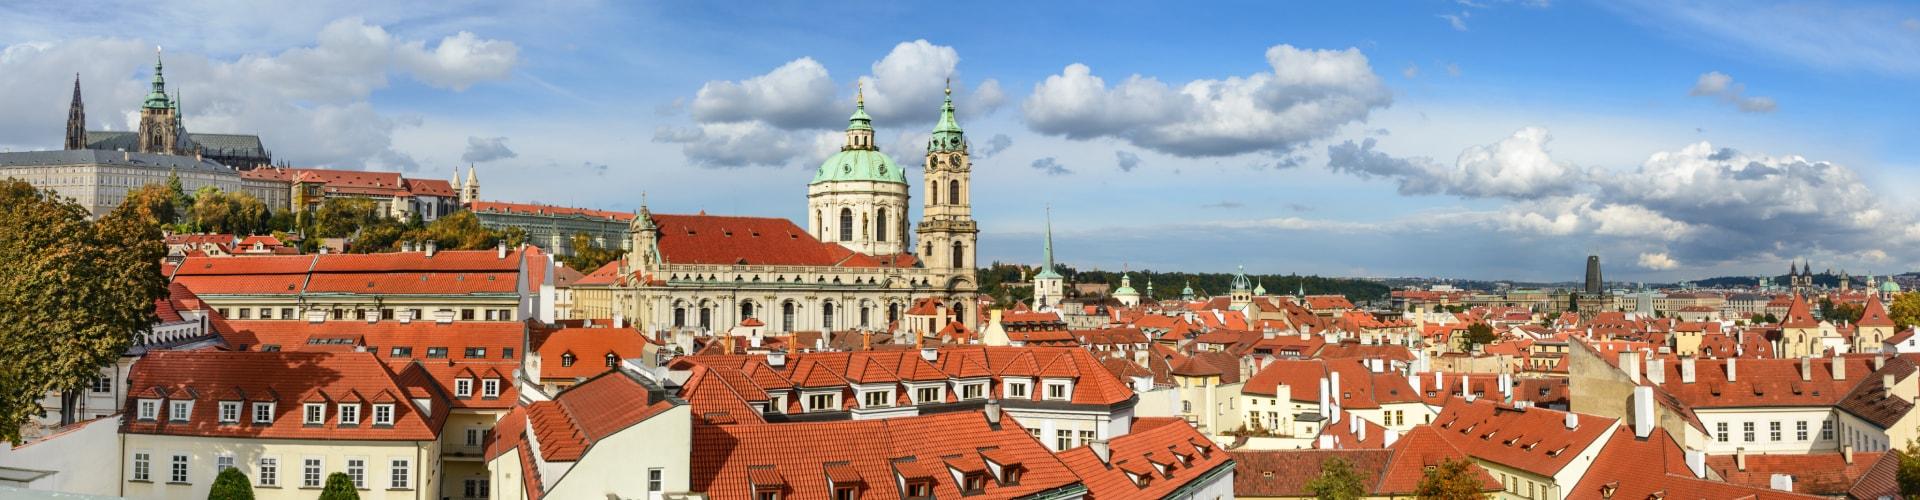 Чехия Прага eurostudy